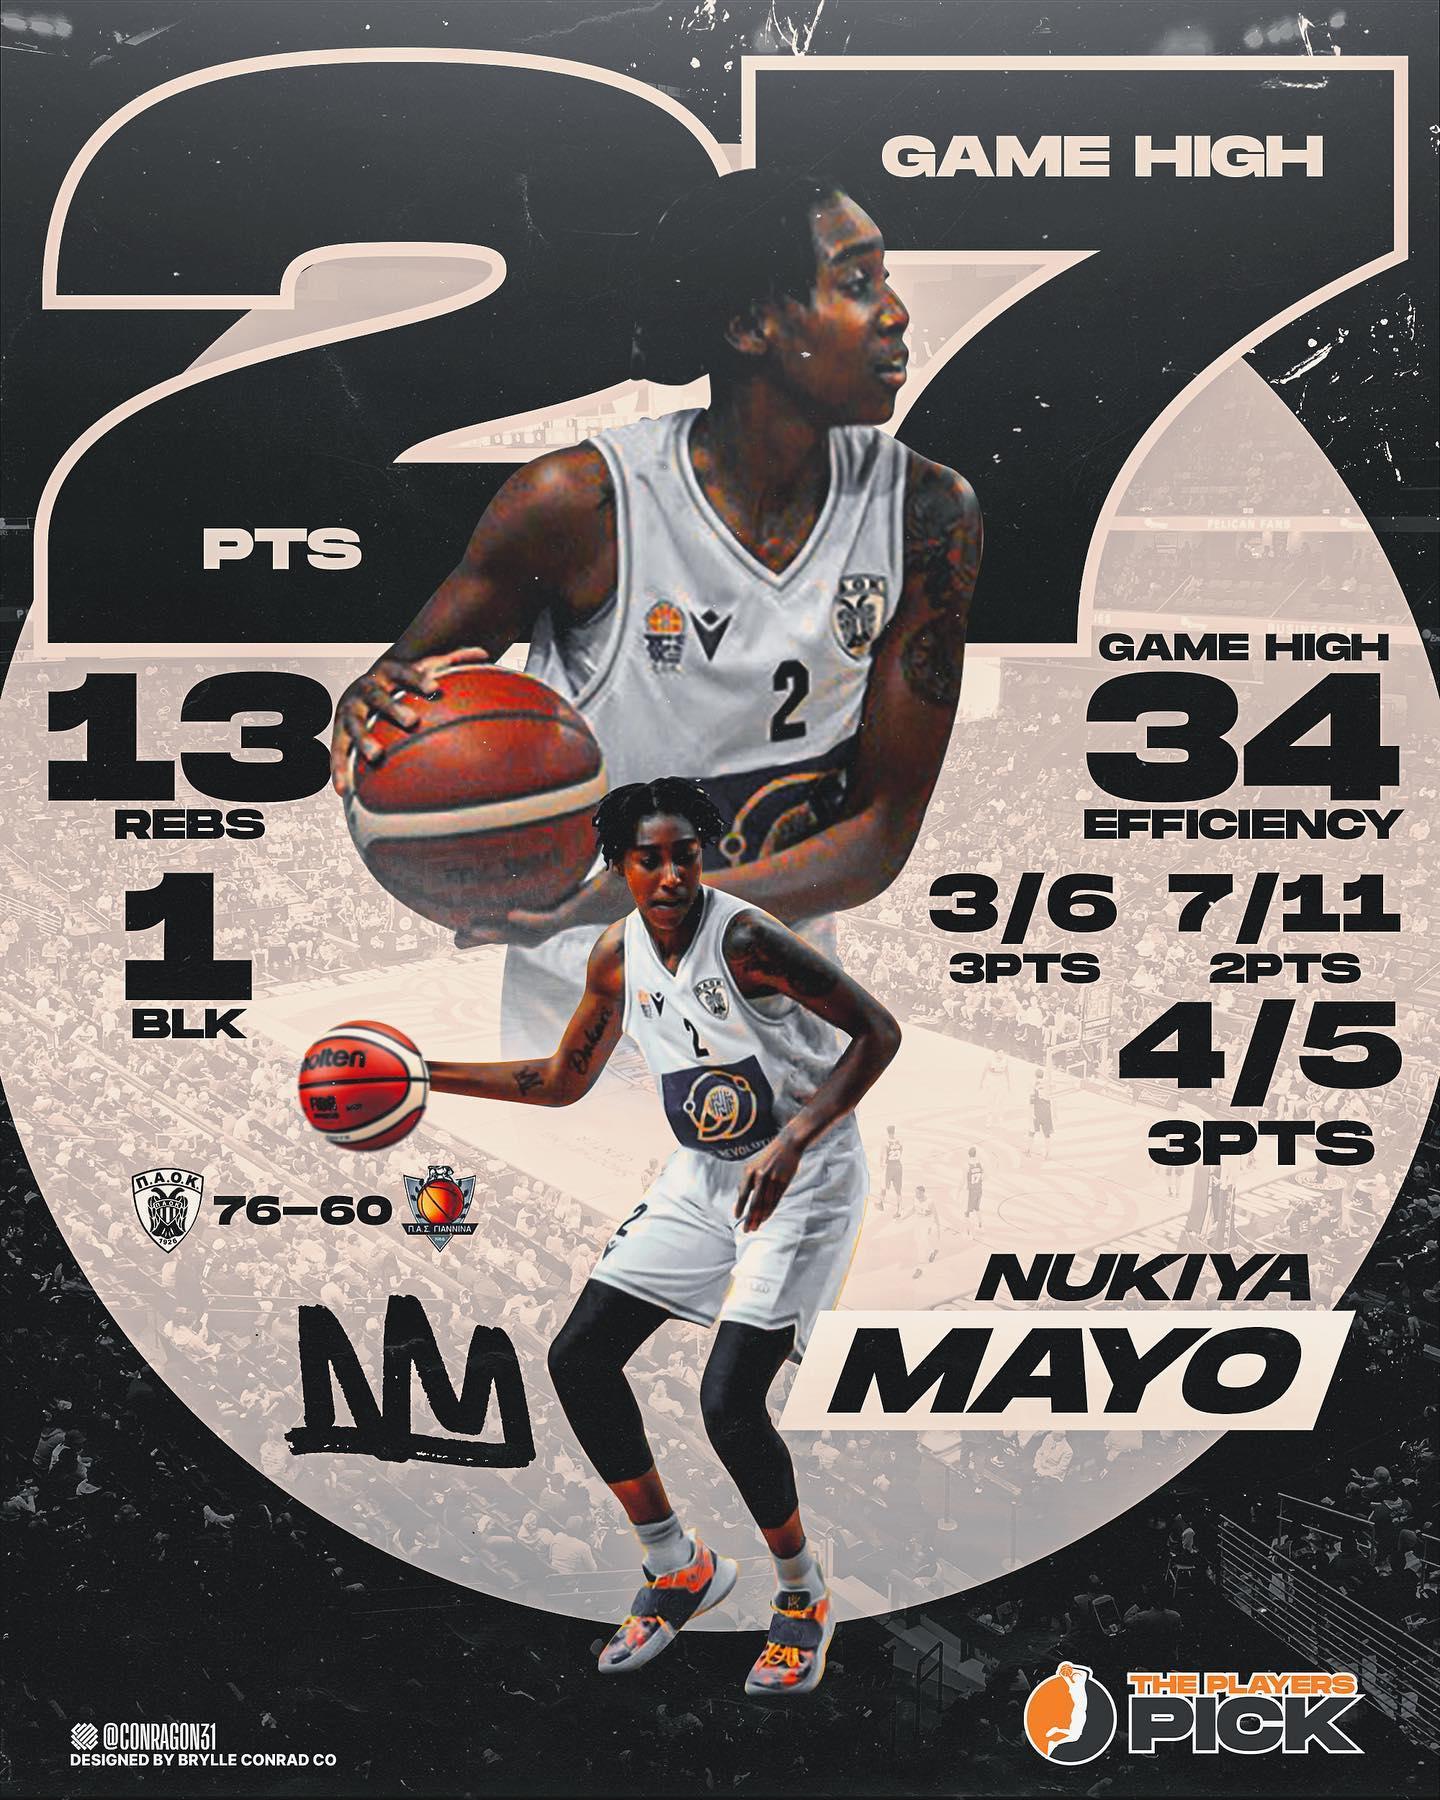 27 points & 13 rebounds vs PAS Giannina for league leader Nukiya Mayo!